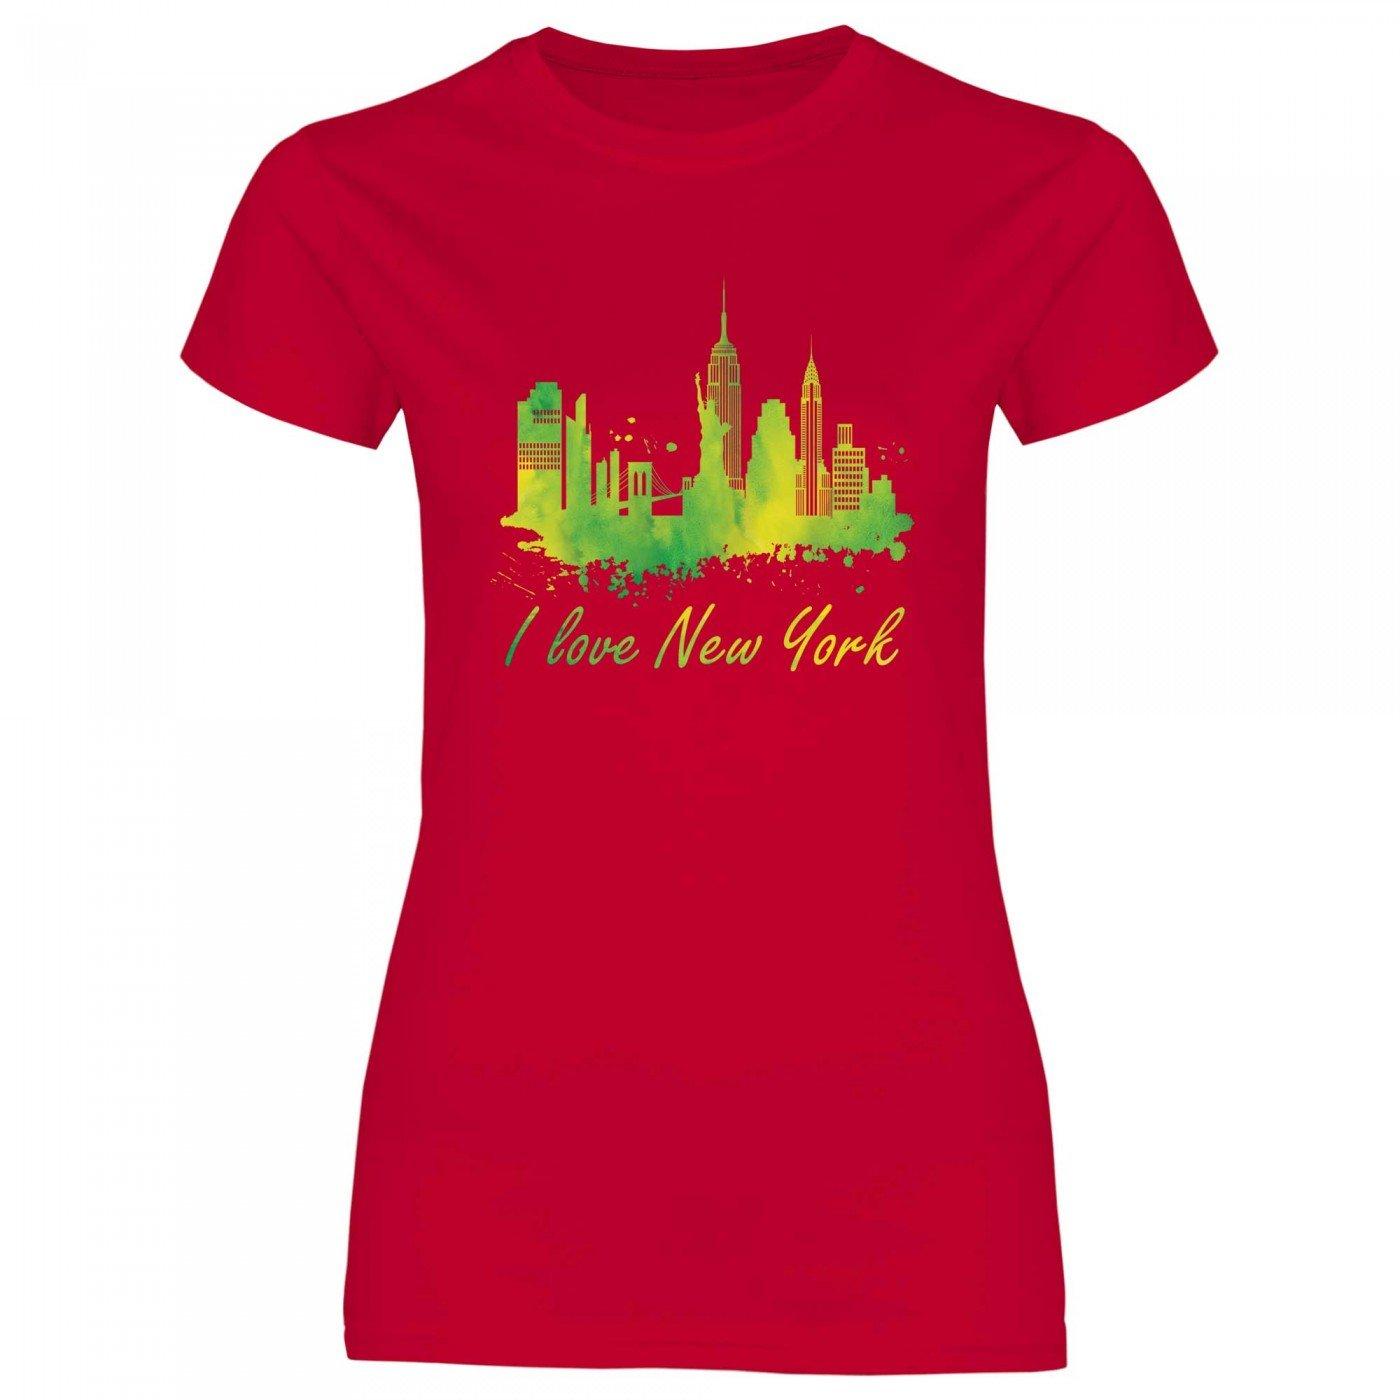 Royal Shirt rs115 Damen T-Shirt I love Rome mit Fahne Italien Städtetrip Flagge